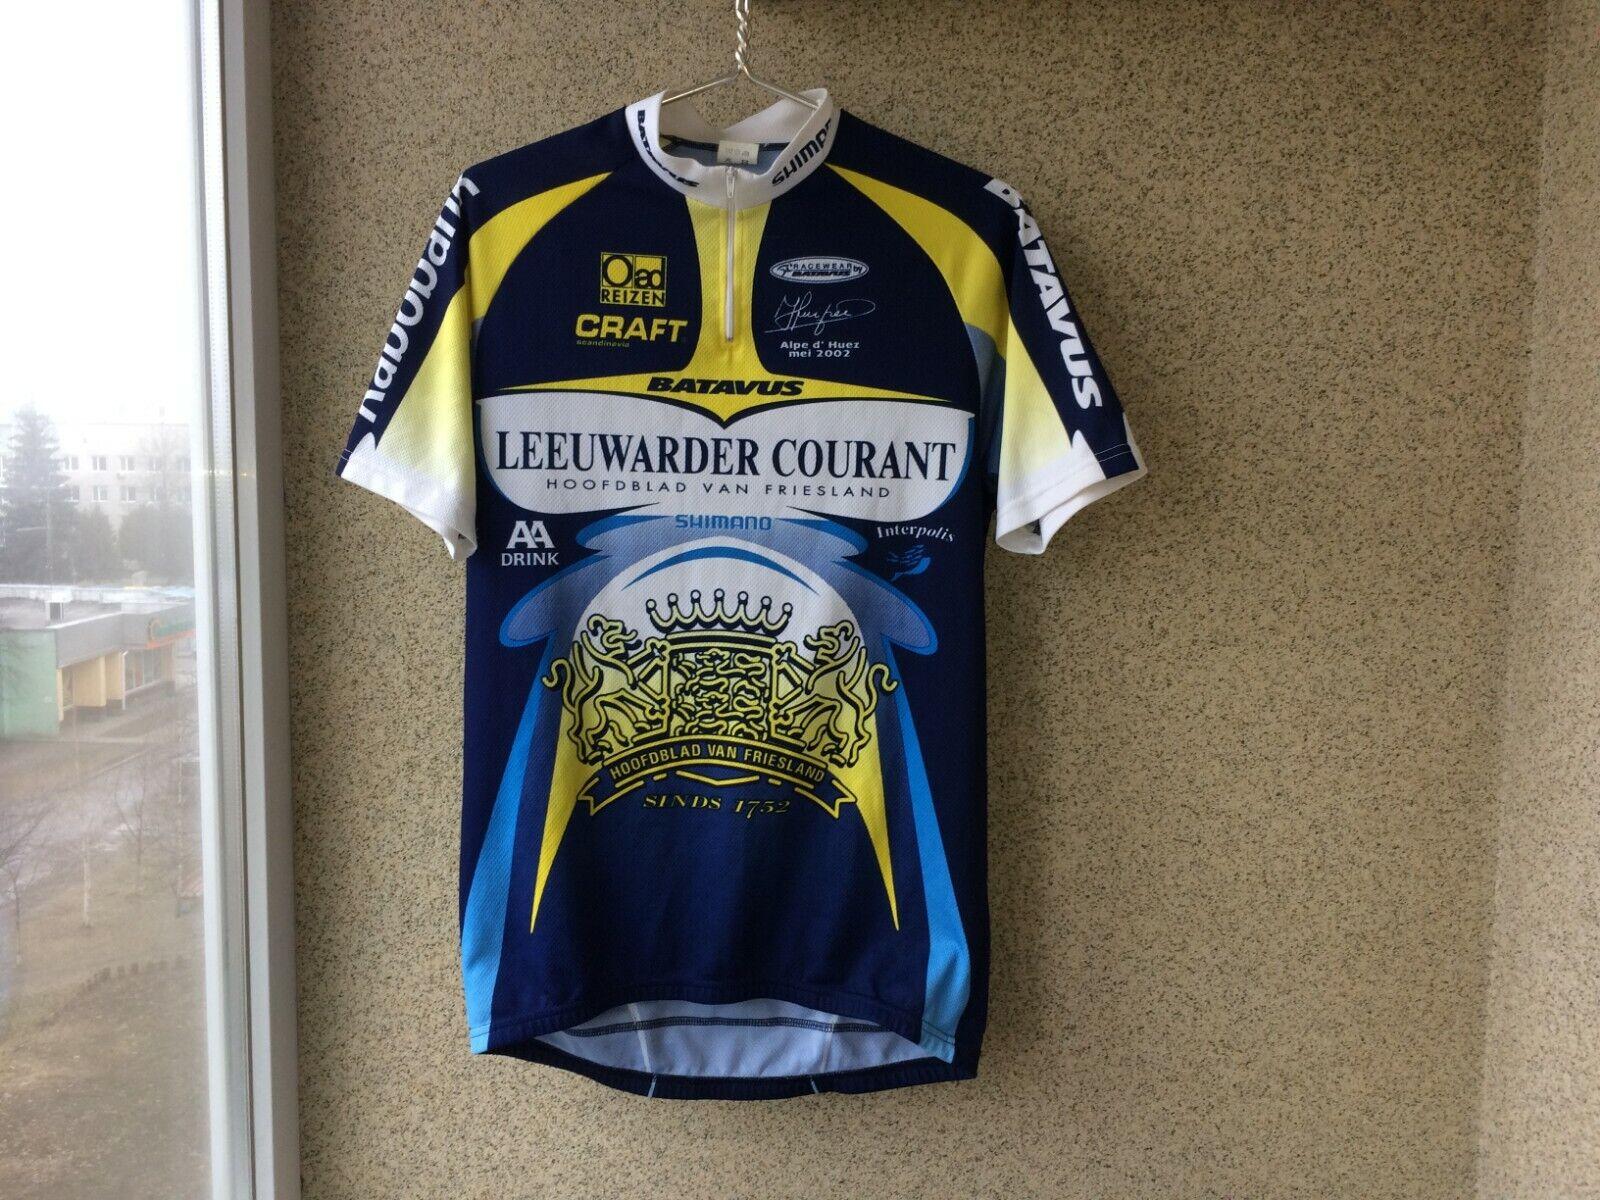 Leeuwarder Courant Cycling Shirt 6 Jersey Shimano Batavus Camiseta